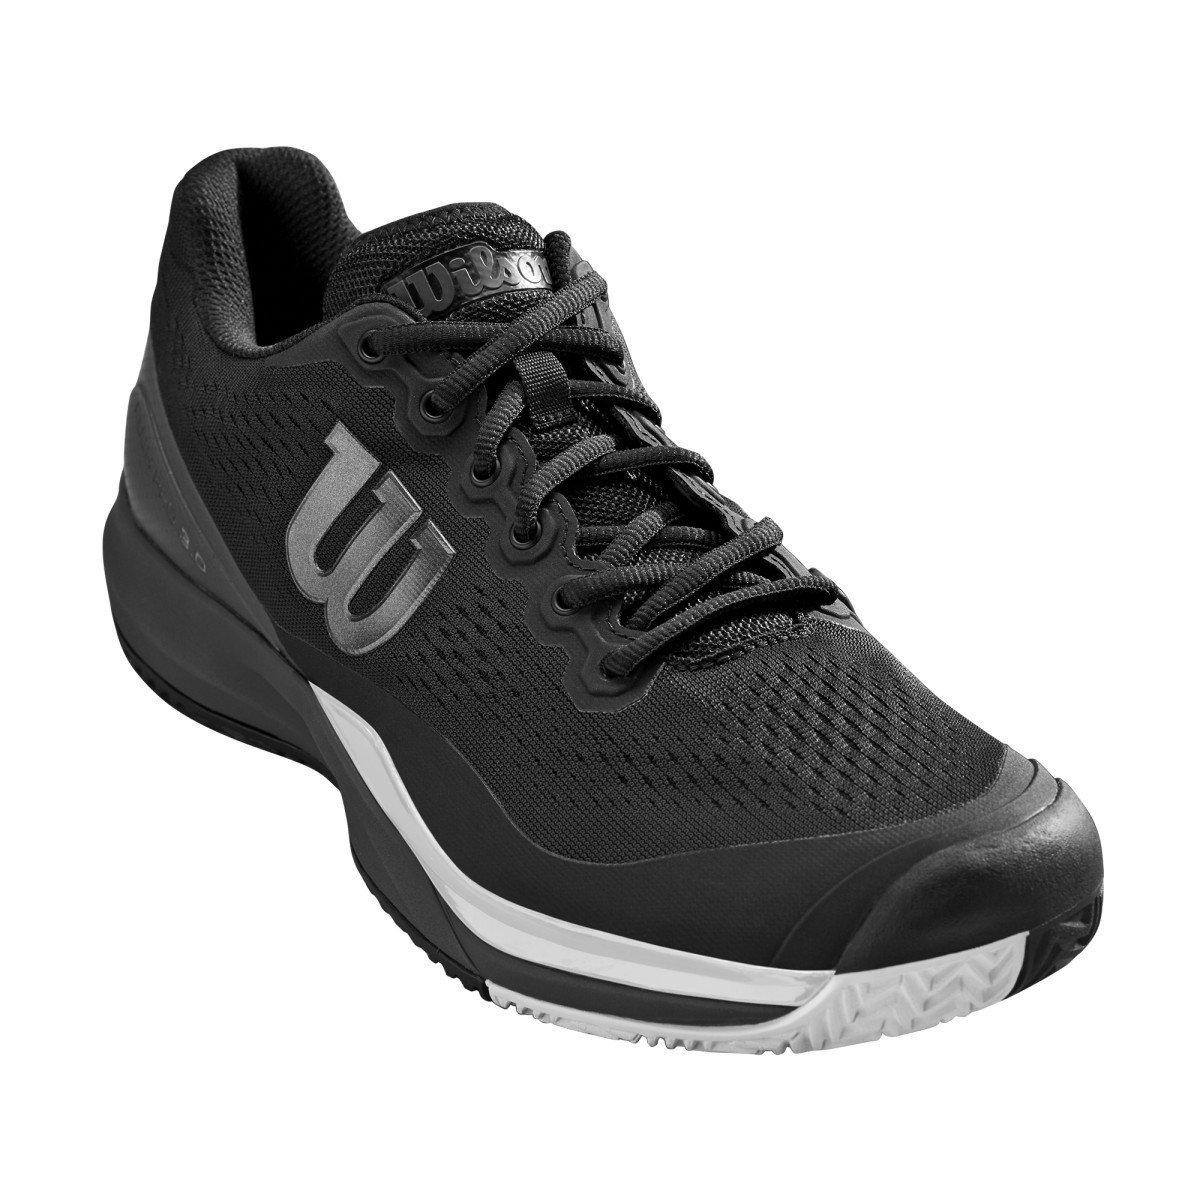 Wilson Tennis Shoes – 2019 Men's Rush Pro 3.0 (black)